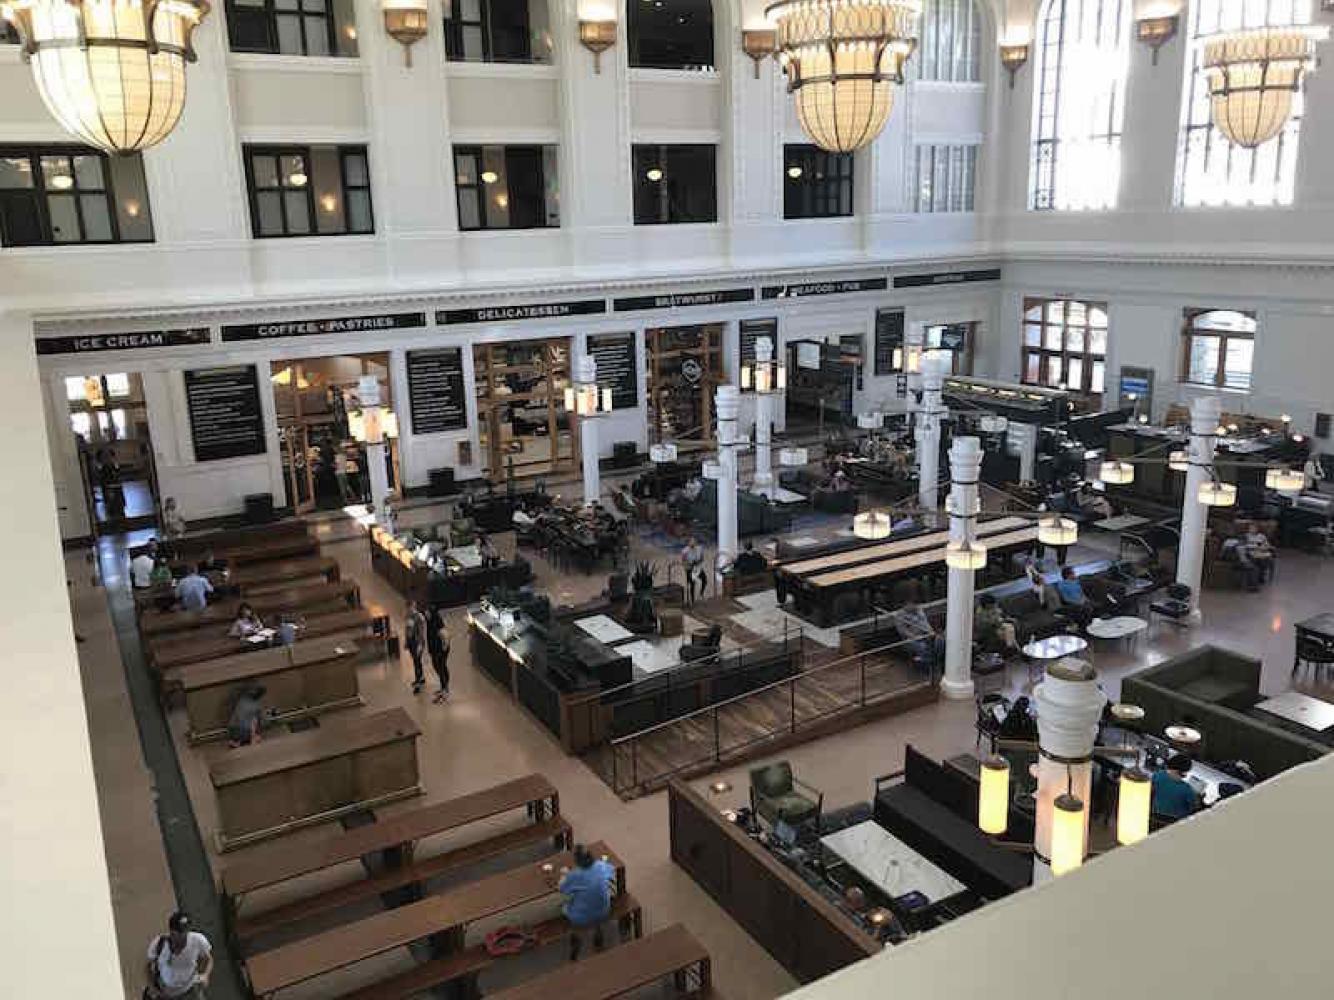 170826 Union Station Interior